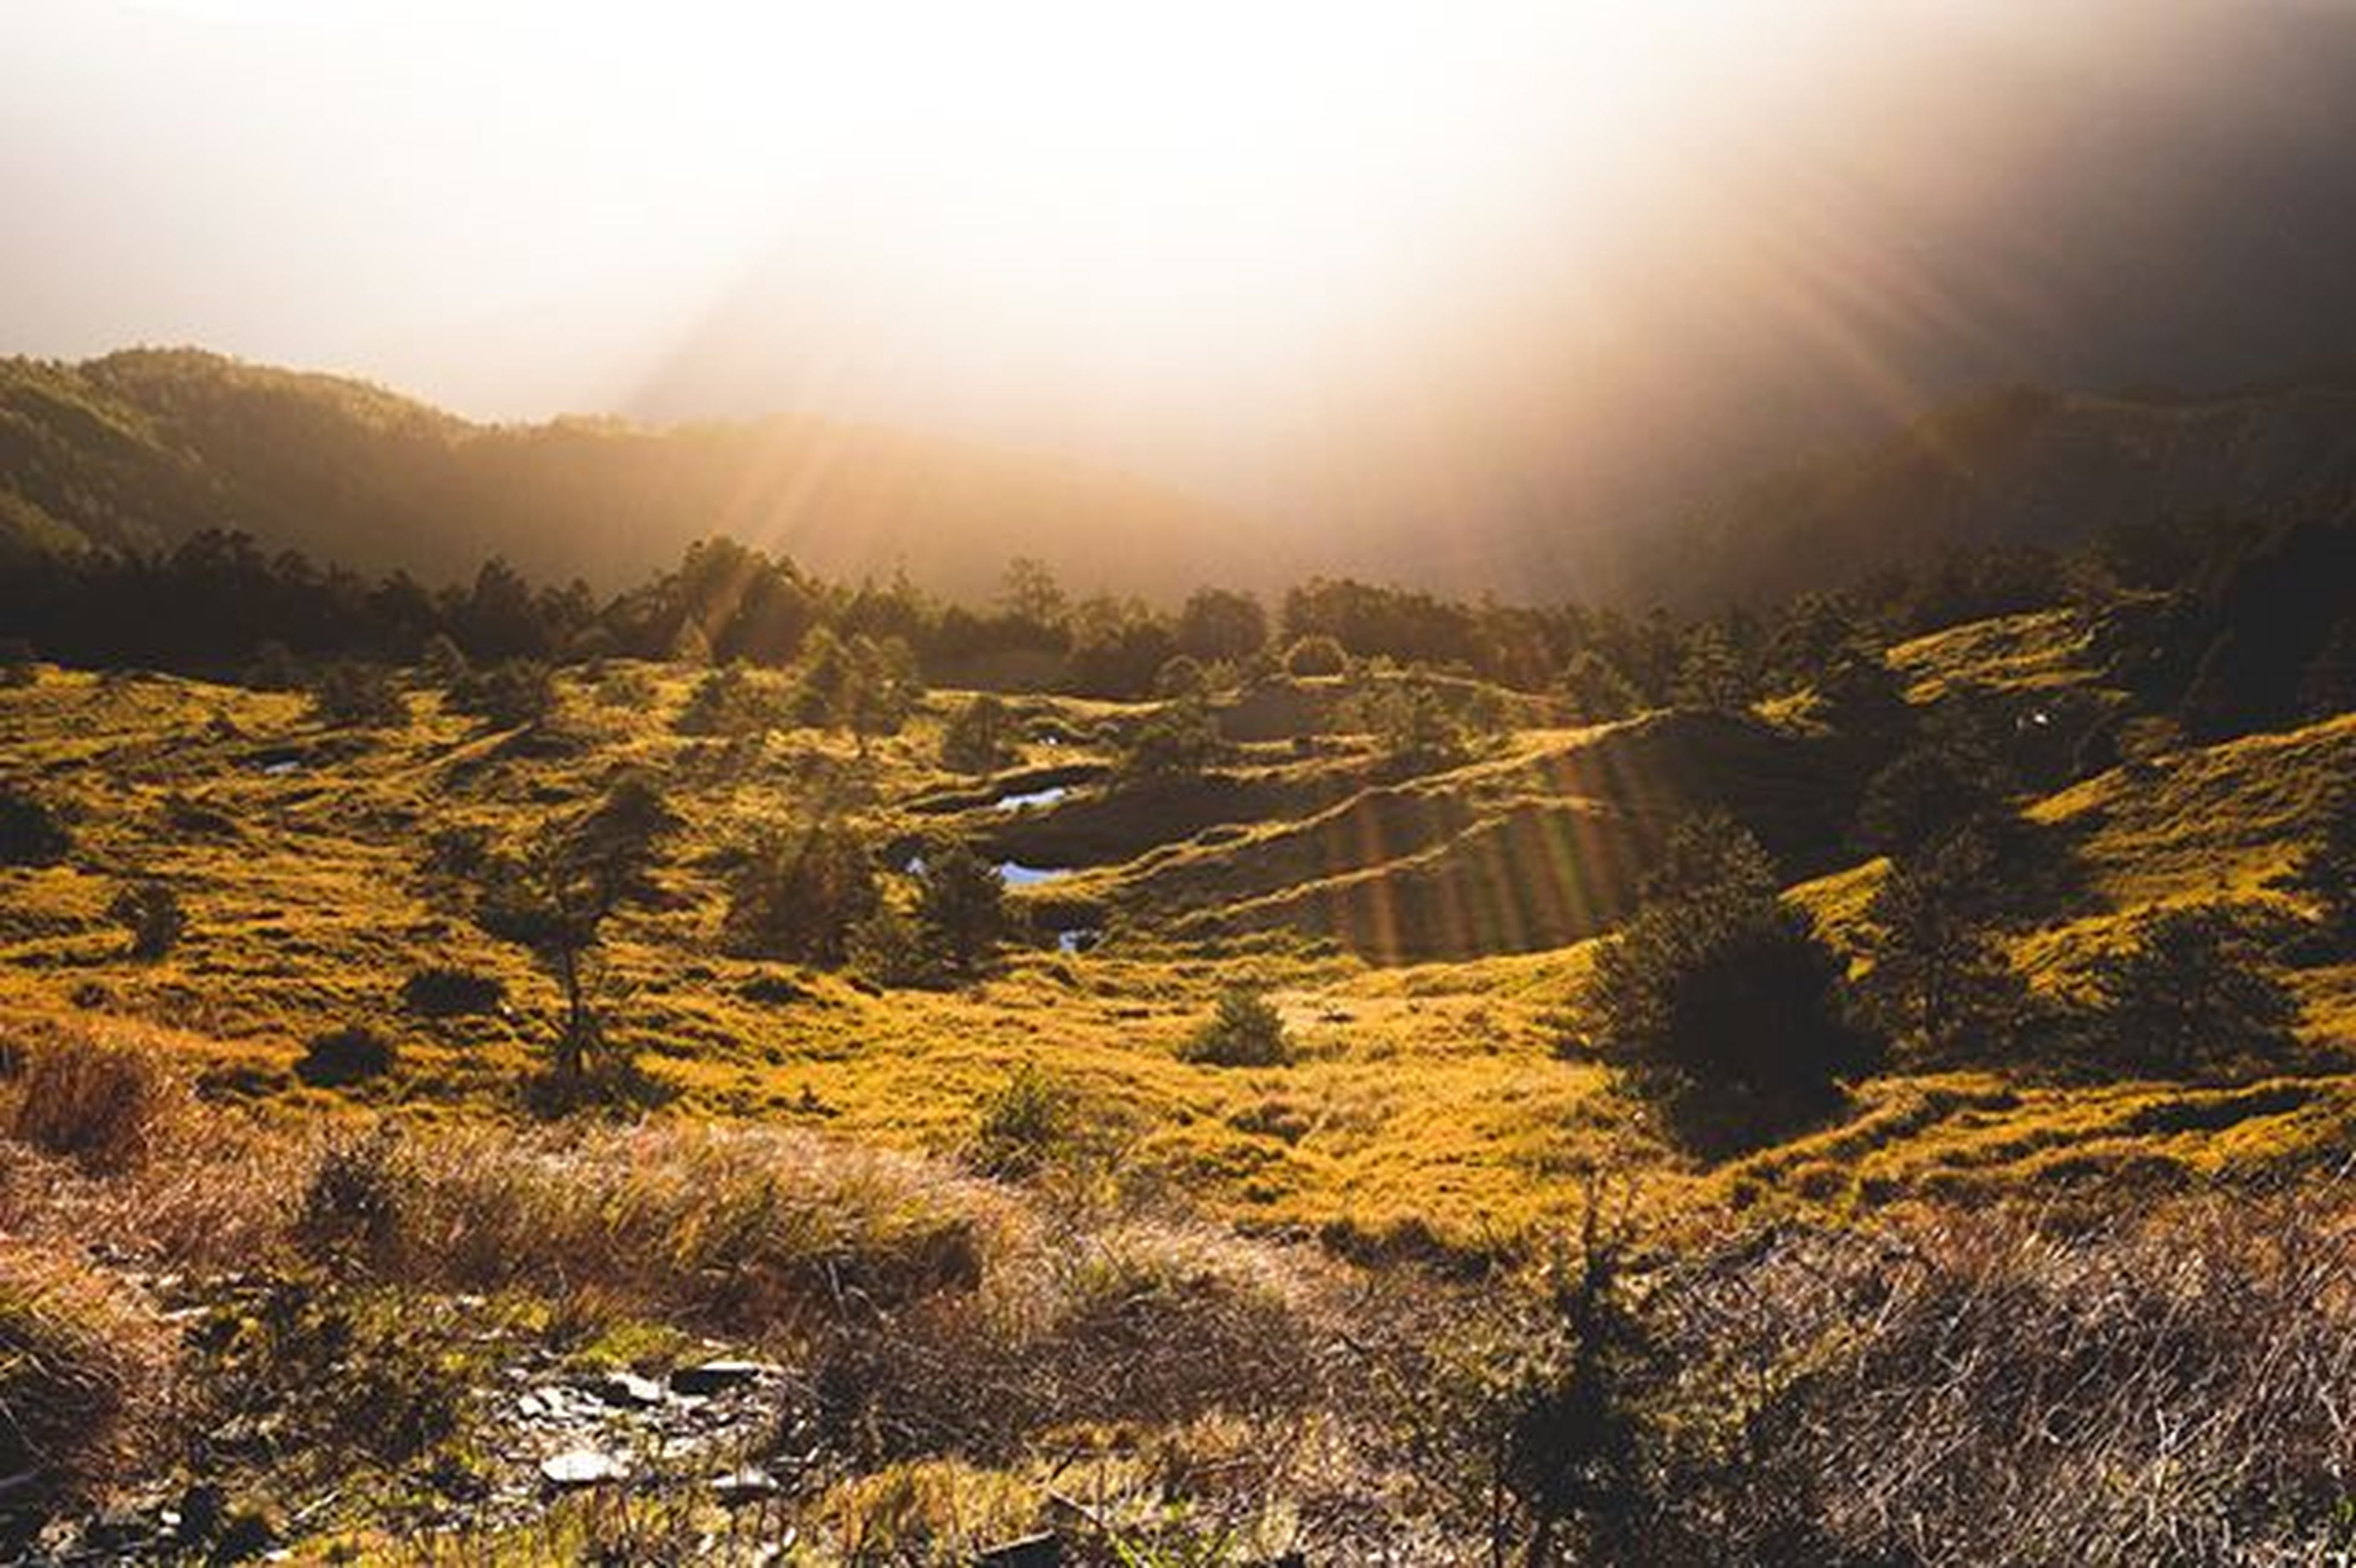 sun, mountain, tranquility, tranquil scene, landscape, sunlight, sunbeam, lens flare, scenics, sunset, beauty in nature, nature, sky, non-urban scene, idyllic, field, mountain range, no people, plant, outdoors